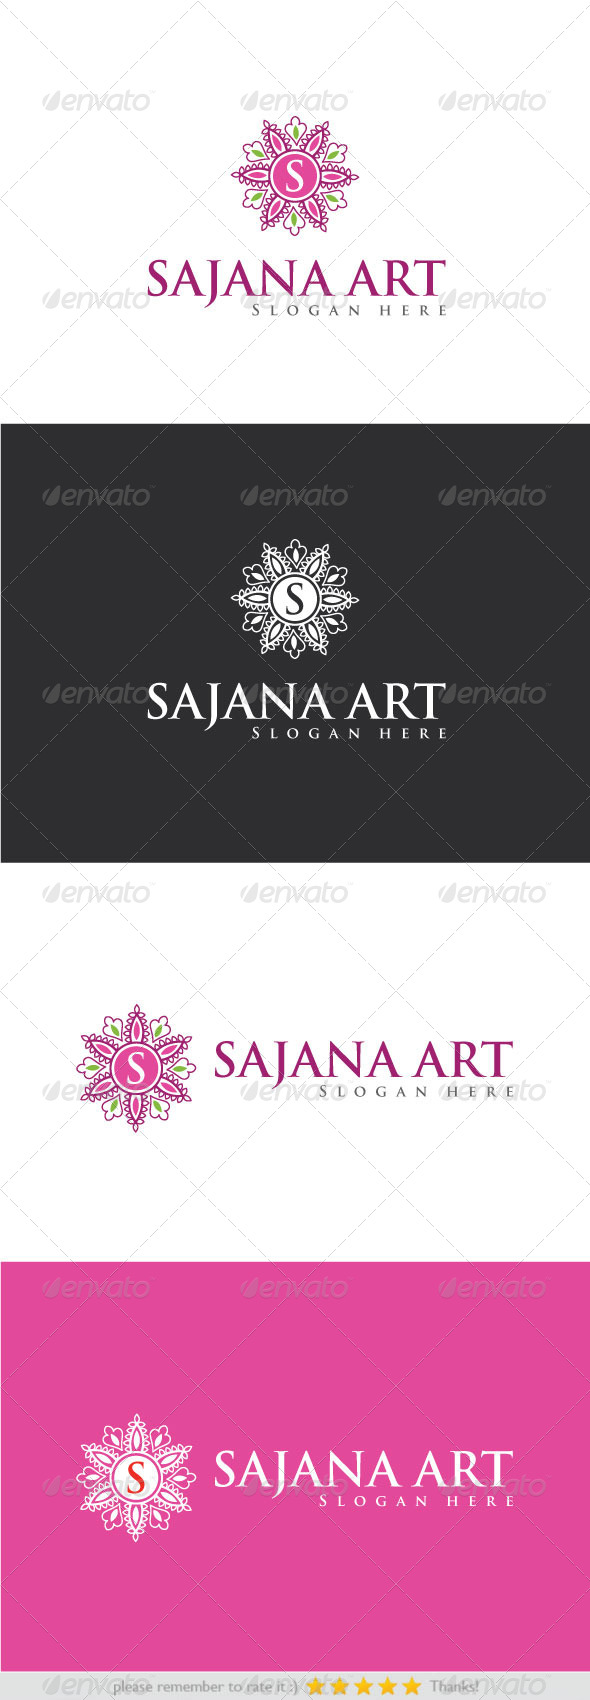 Sajana Art - Nature Logo Templates